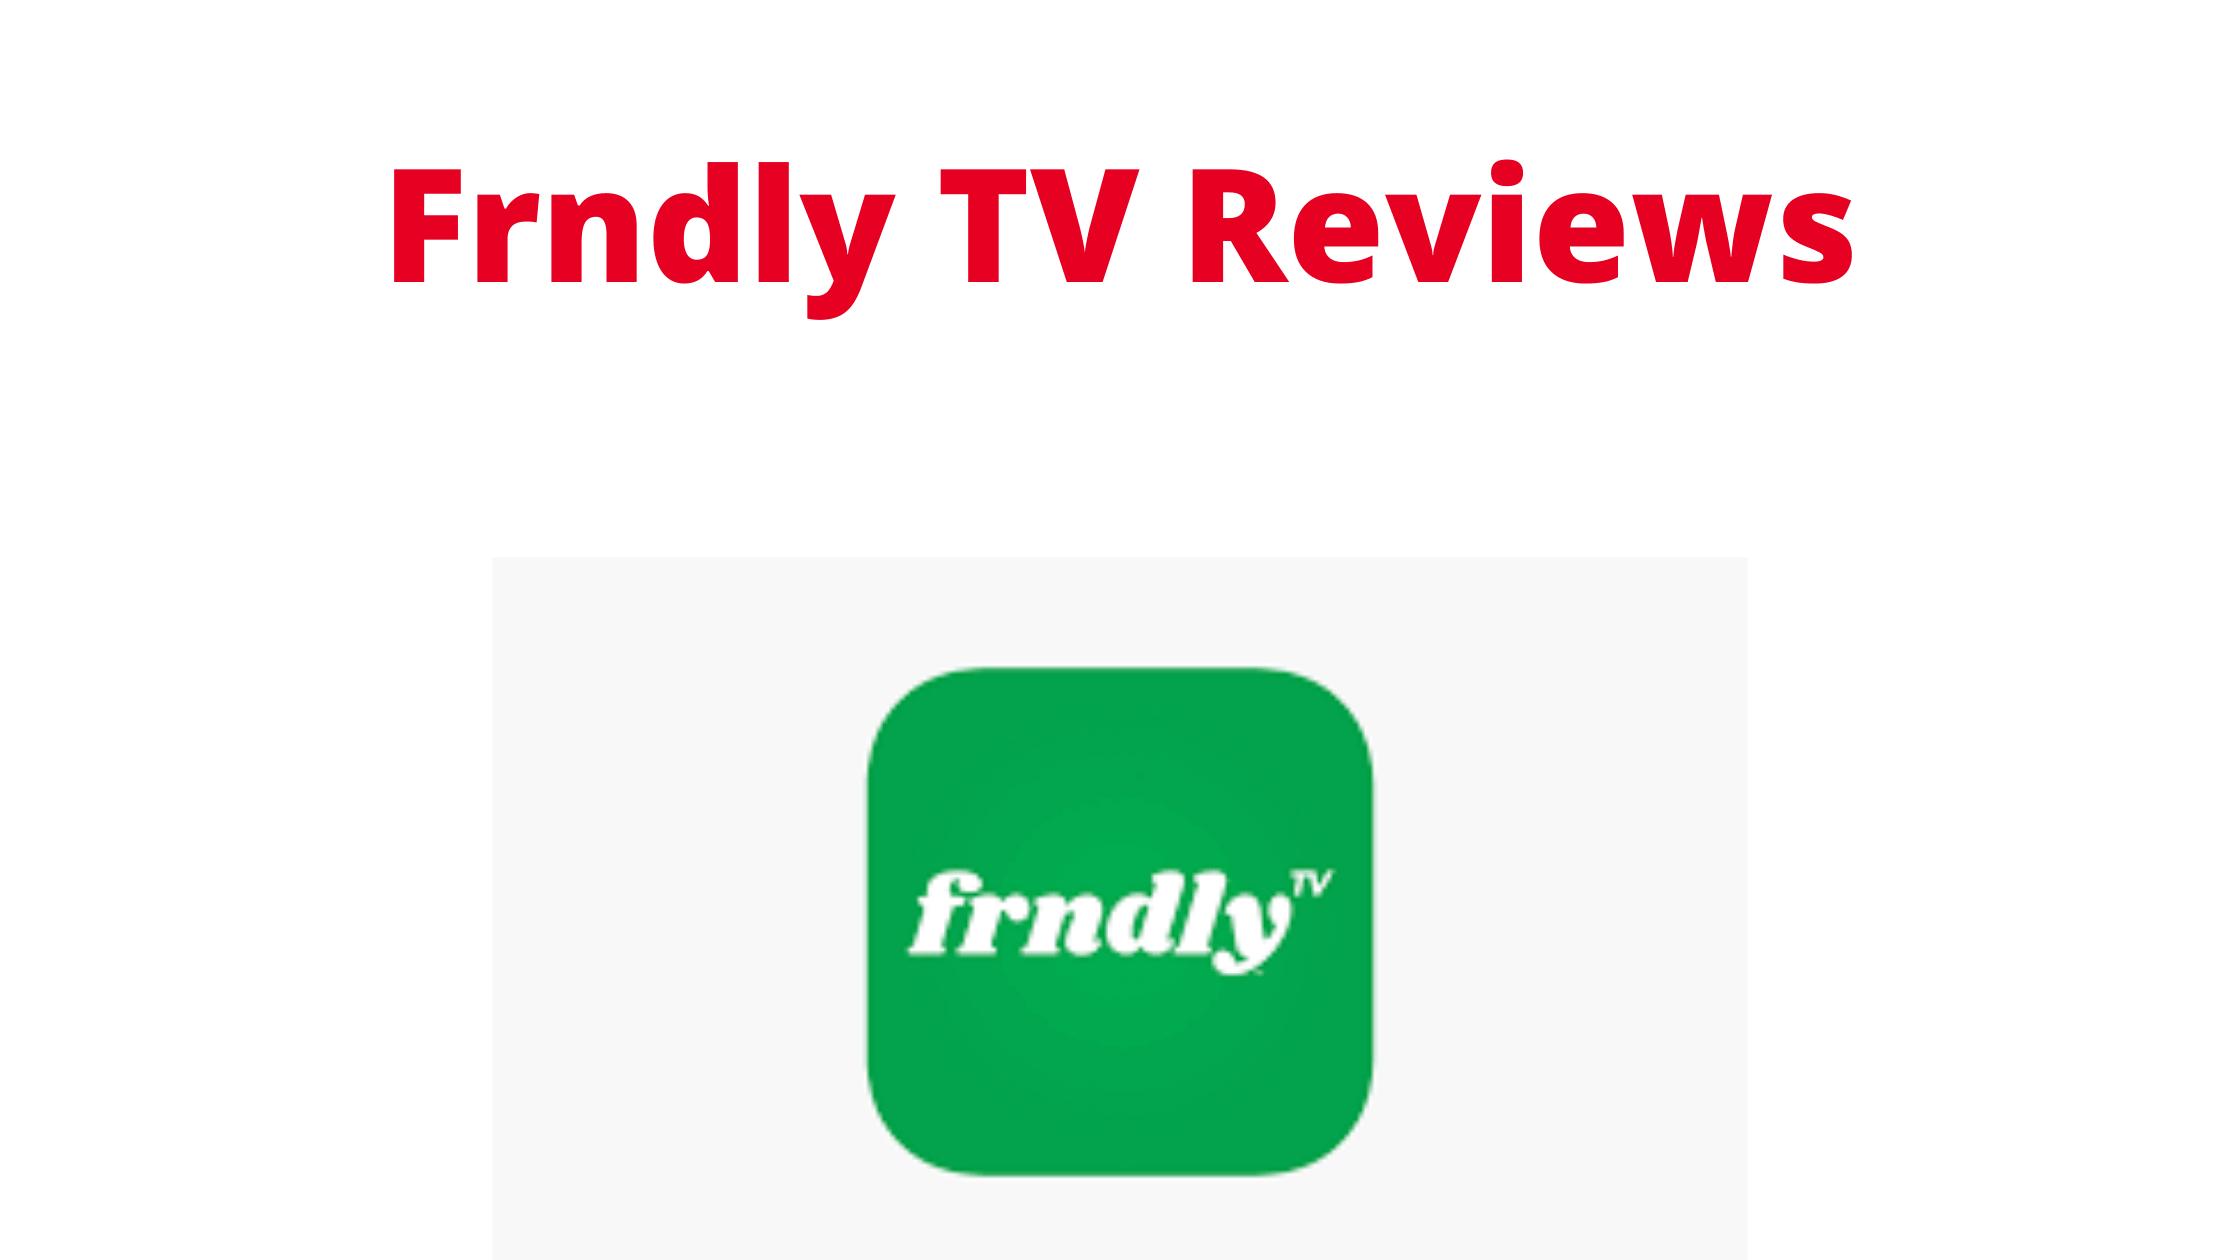 Frndly TV Reviews